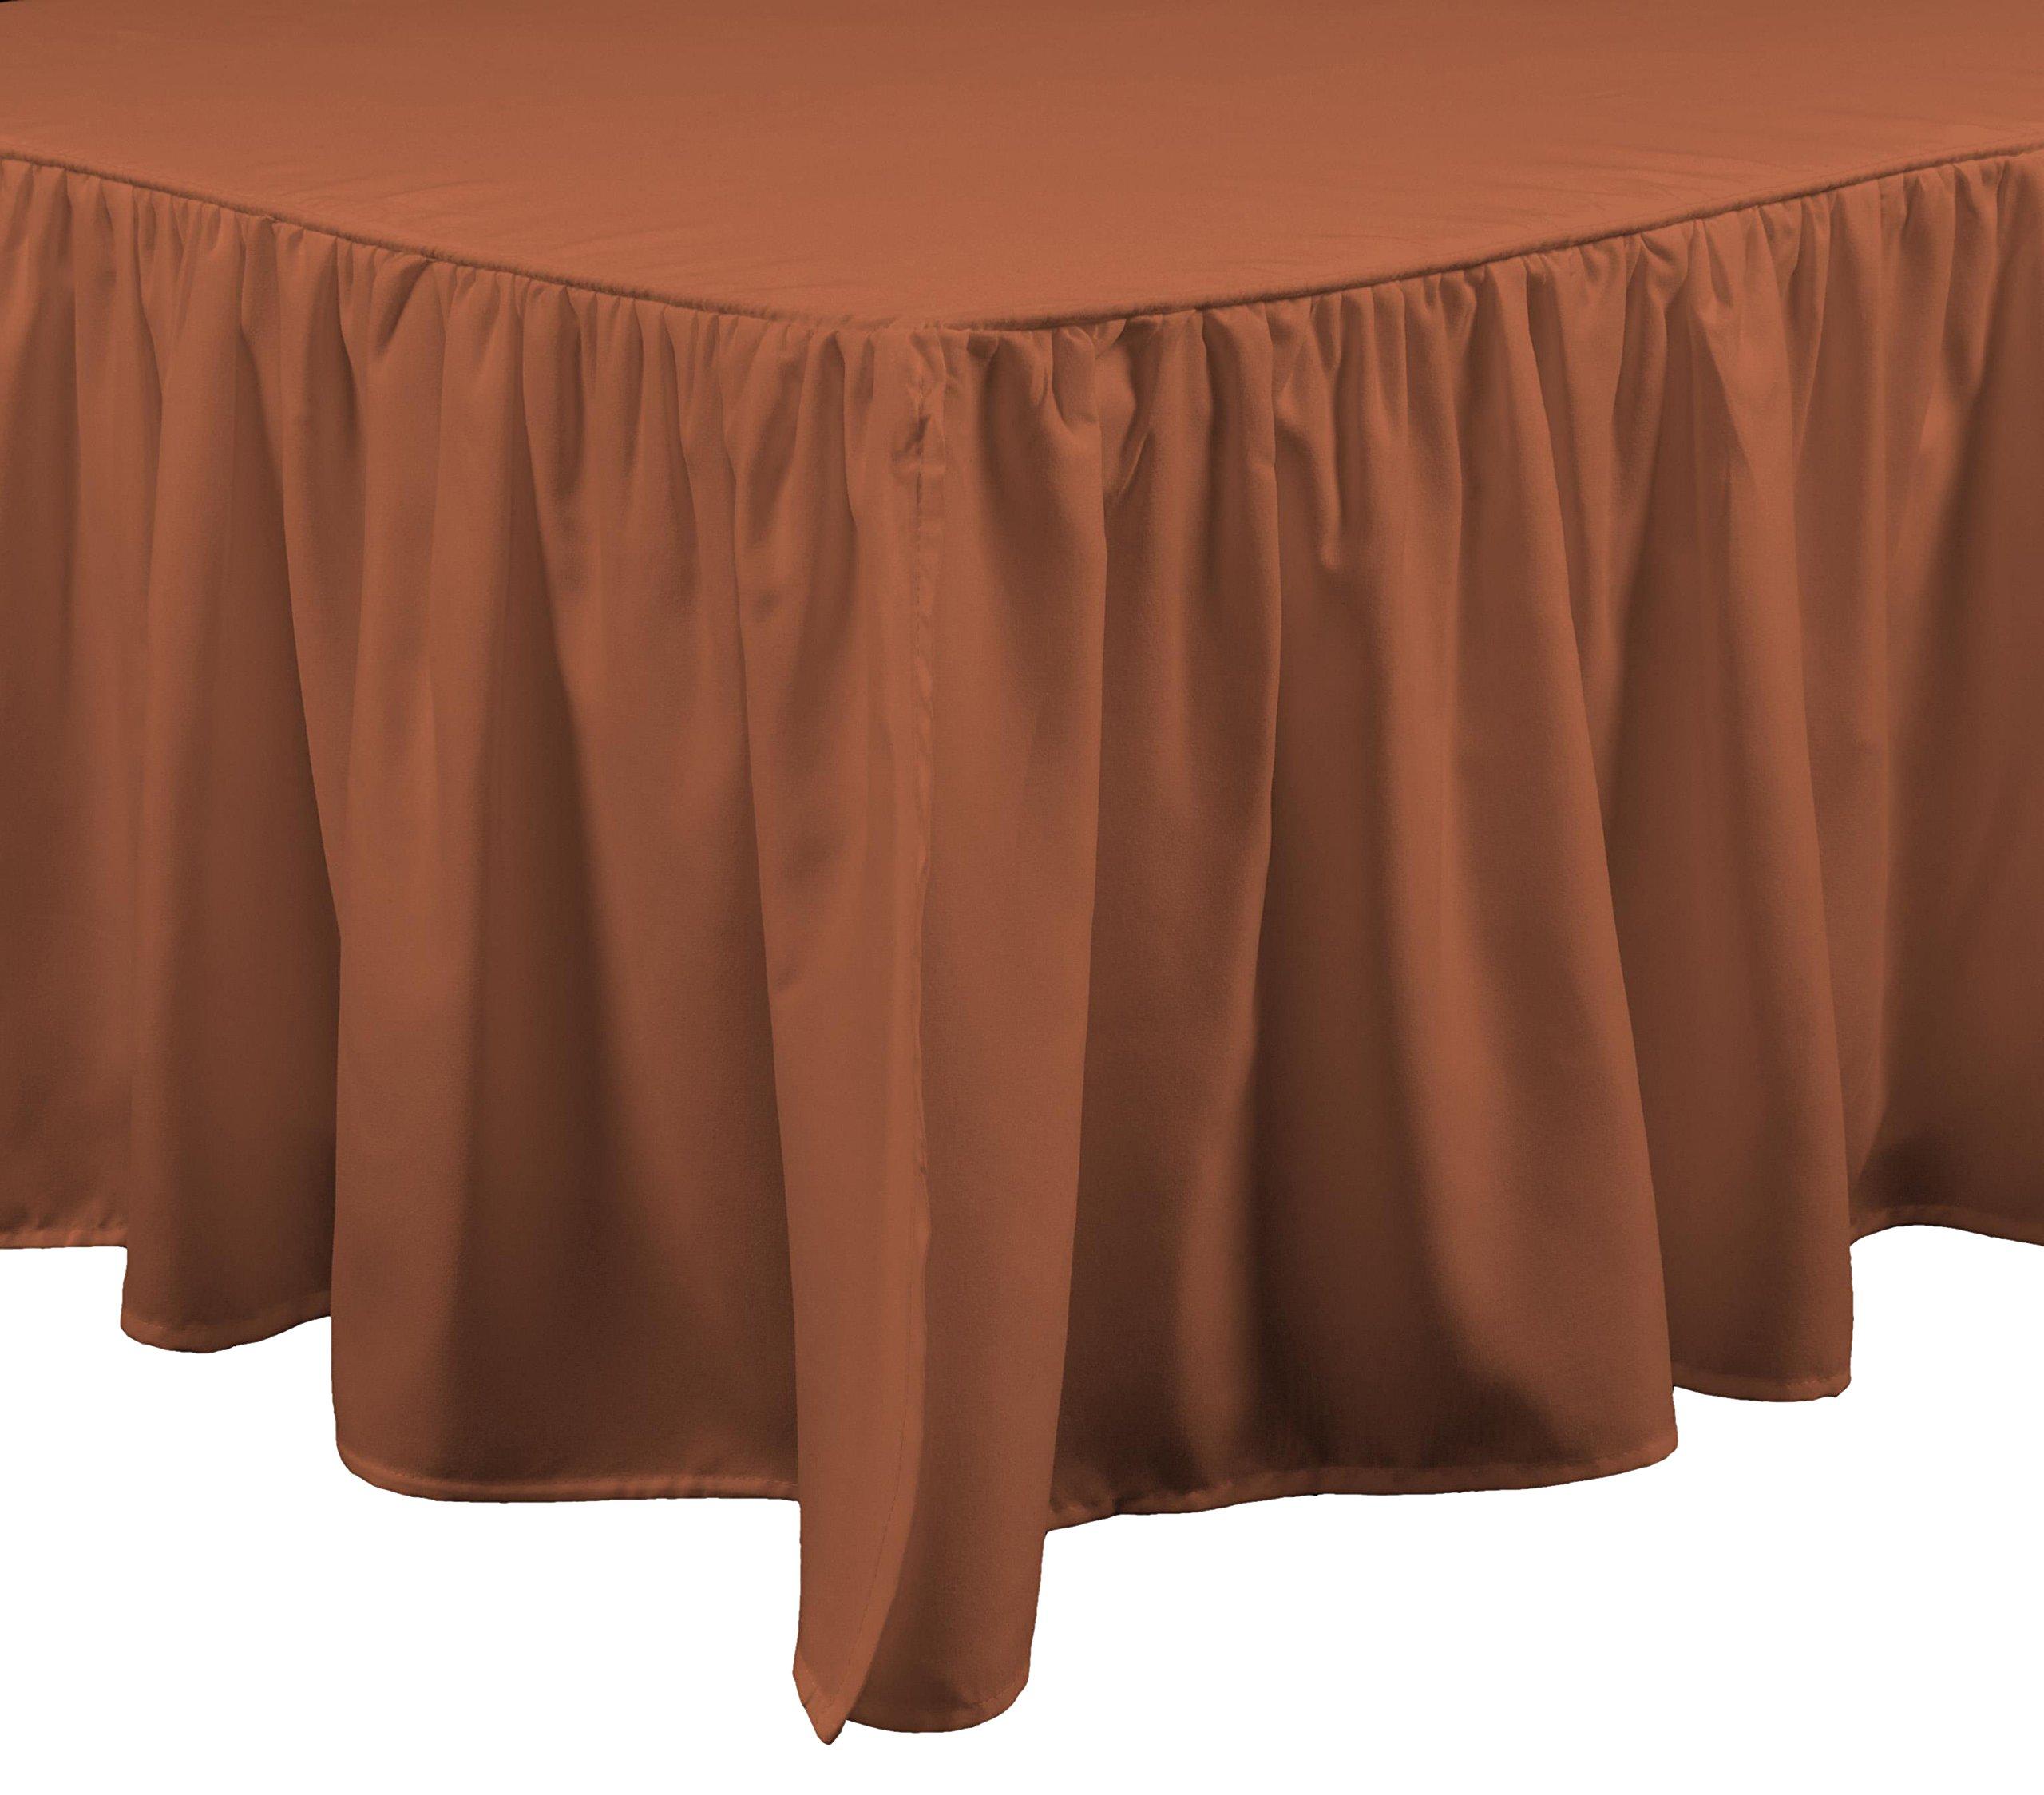 Brielle Casablanca Bed Skirt, Queen, Spice